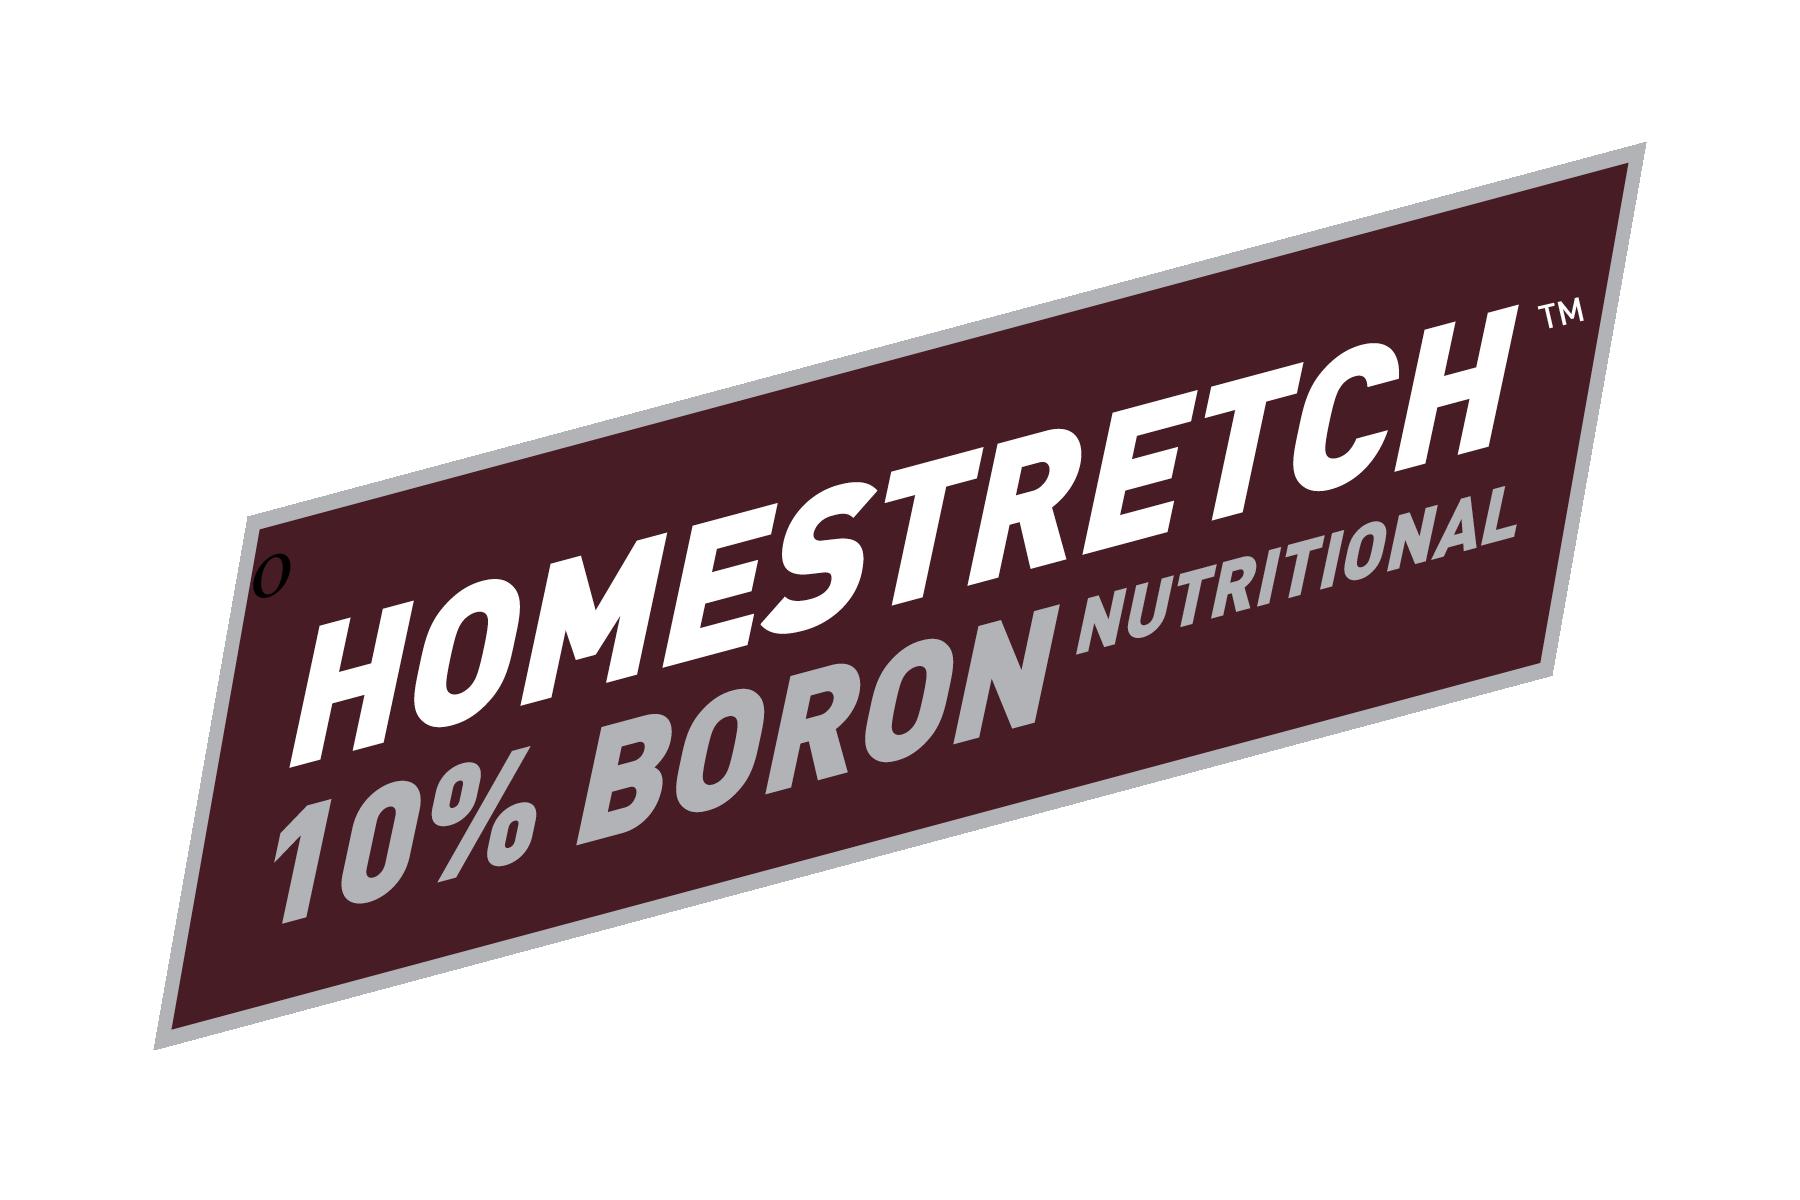 HOMESTRETCH 10% BORON